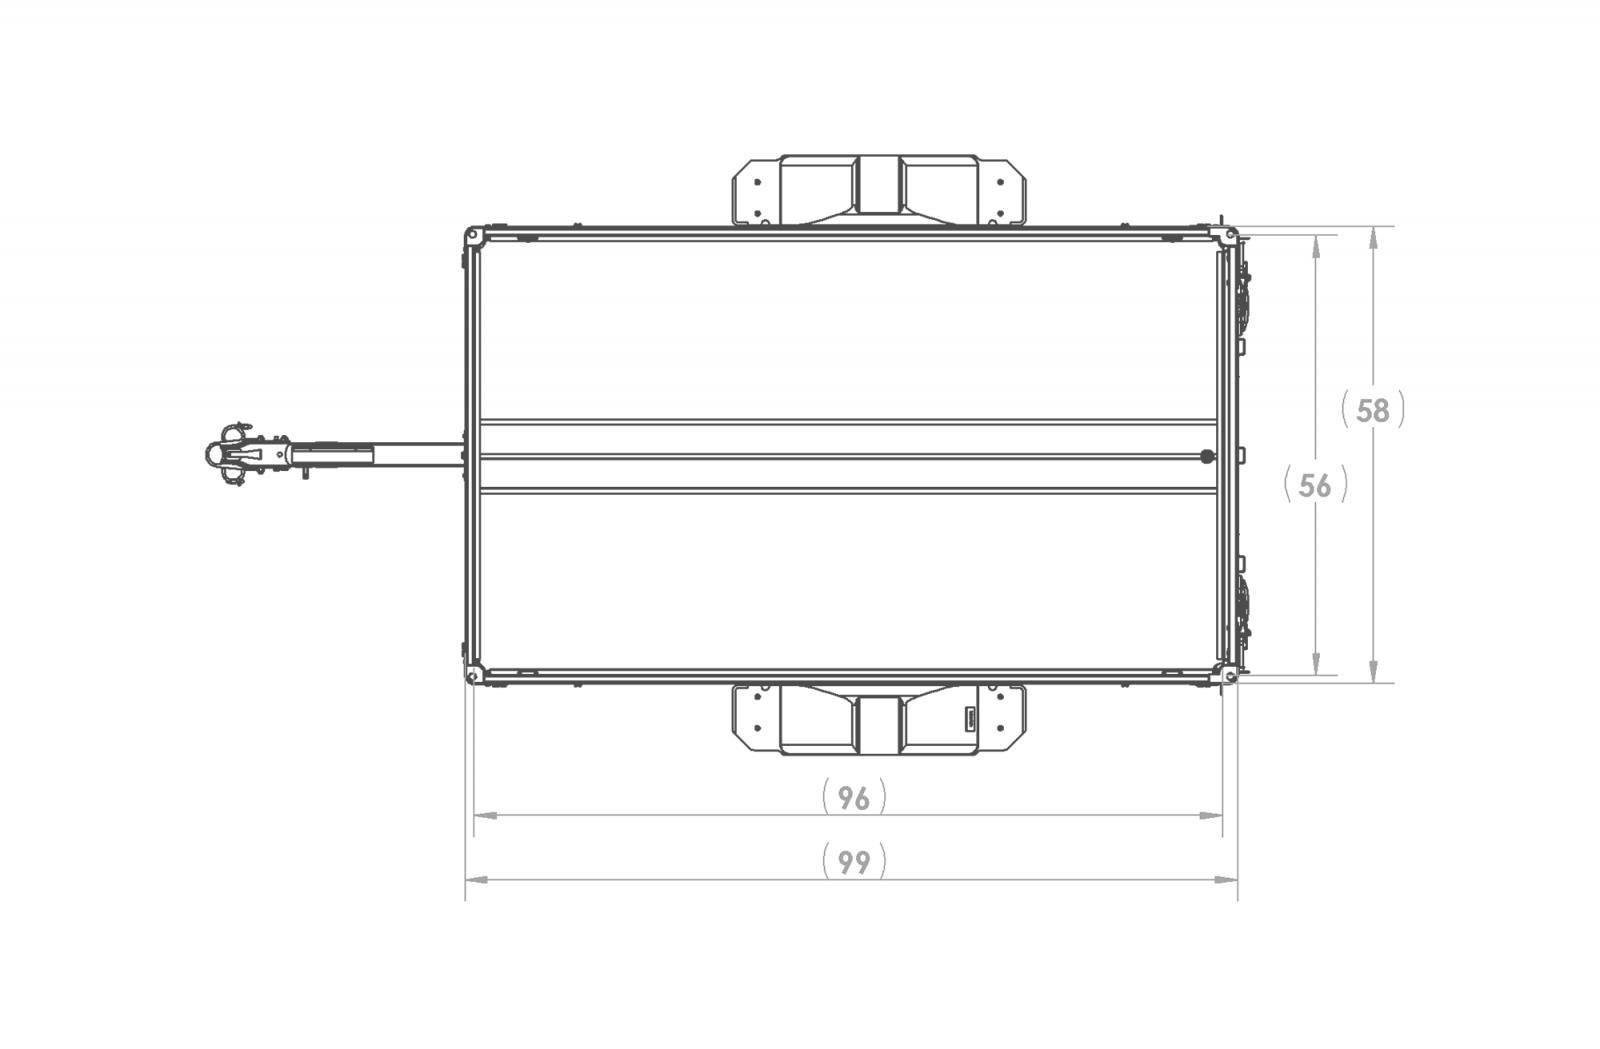 2019 Karavan Trailers MFF-2200-56-LP Anodized Aluminum for ... on trolling motor wiring diagram, bilge pump wiring diagram, standard 7 wire trailer diagram, compass wiring diagram, karavan tires, truck camper wiring diagram, tekonsha brake controller wiring diagram, led trailer lighting diagram, fish finder wiring diagram, stereo wiring diagram, karavan sure lube system, trailer light diagram, karavan trailer parts diagram, 30 amp rv wiring diagram, typical rv wiring diagram, battery wiring diagram, livewell wiring diagram, tilt bed trailer diagram, silverado brake controller wiring diagram,